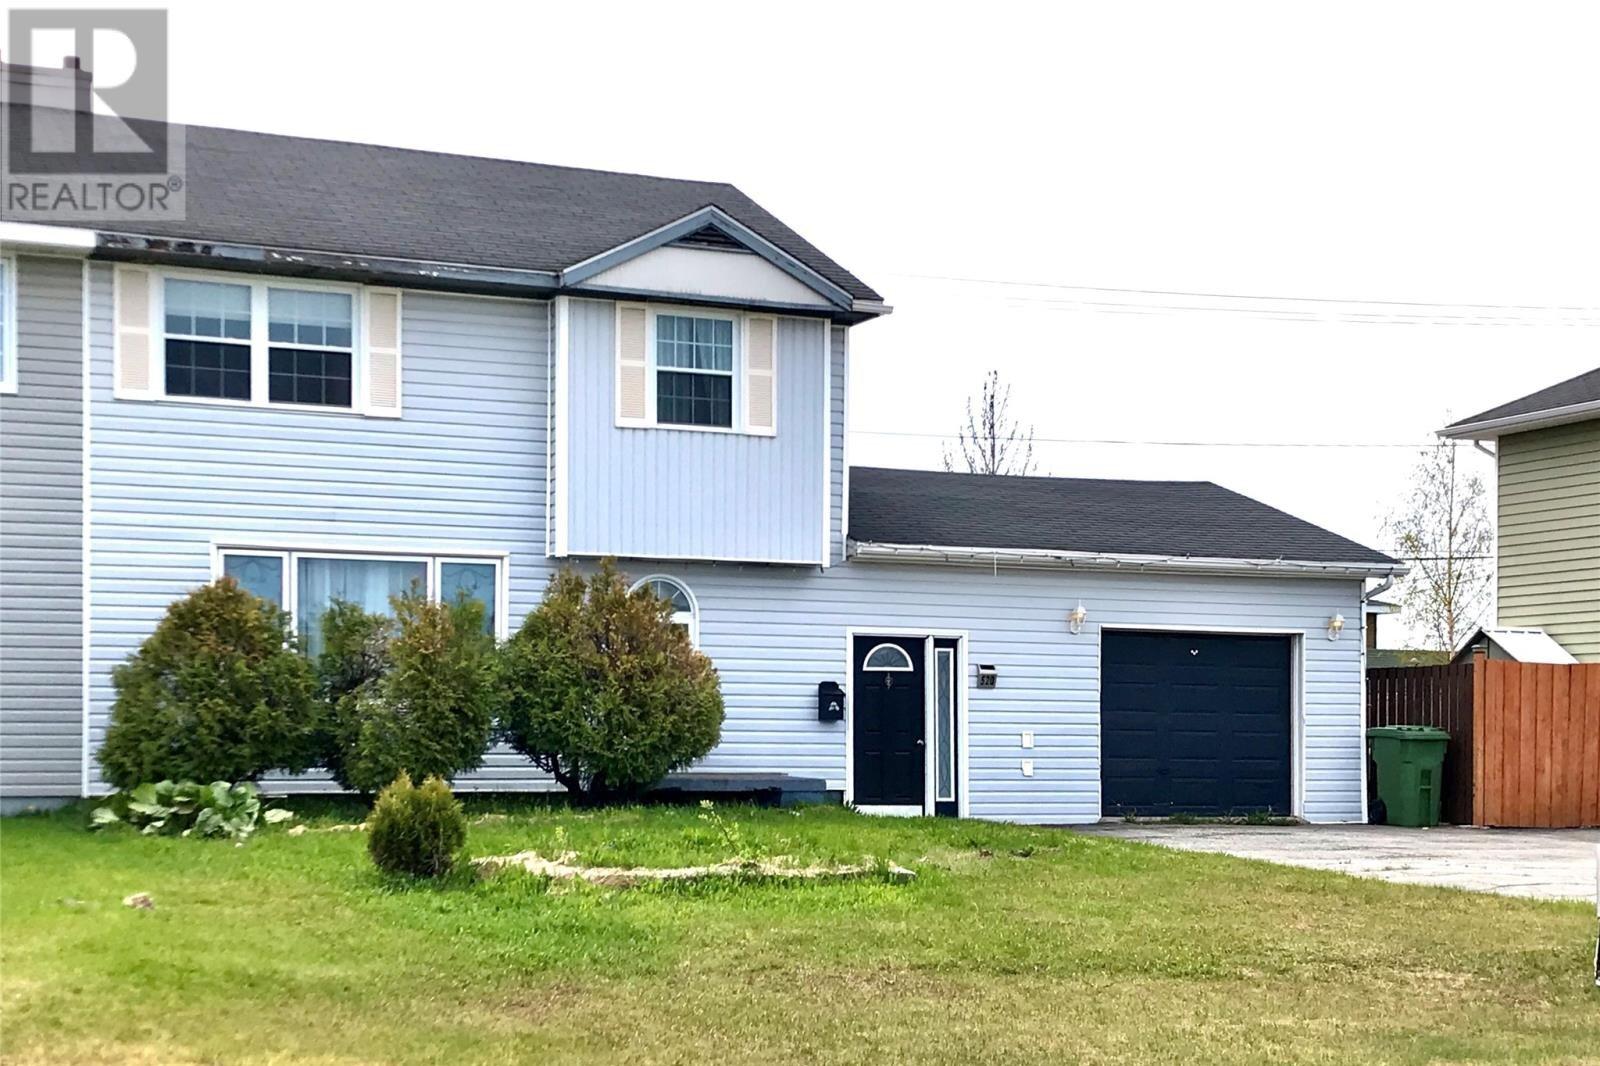 House for sale at 520 Bristol Cres Labrador City Newfoundland - MLS: 1213367